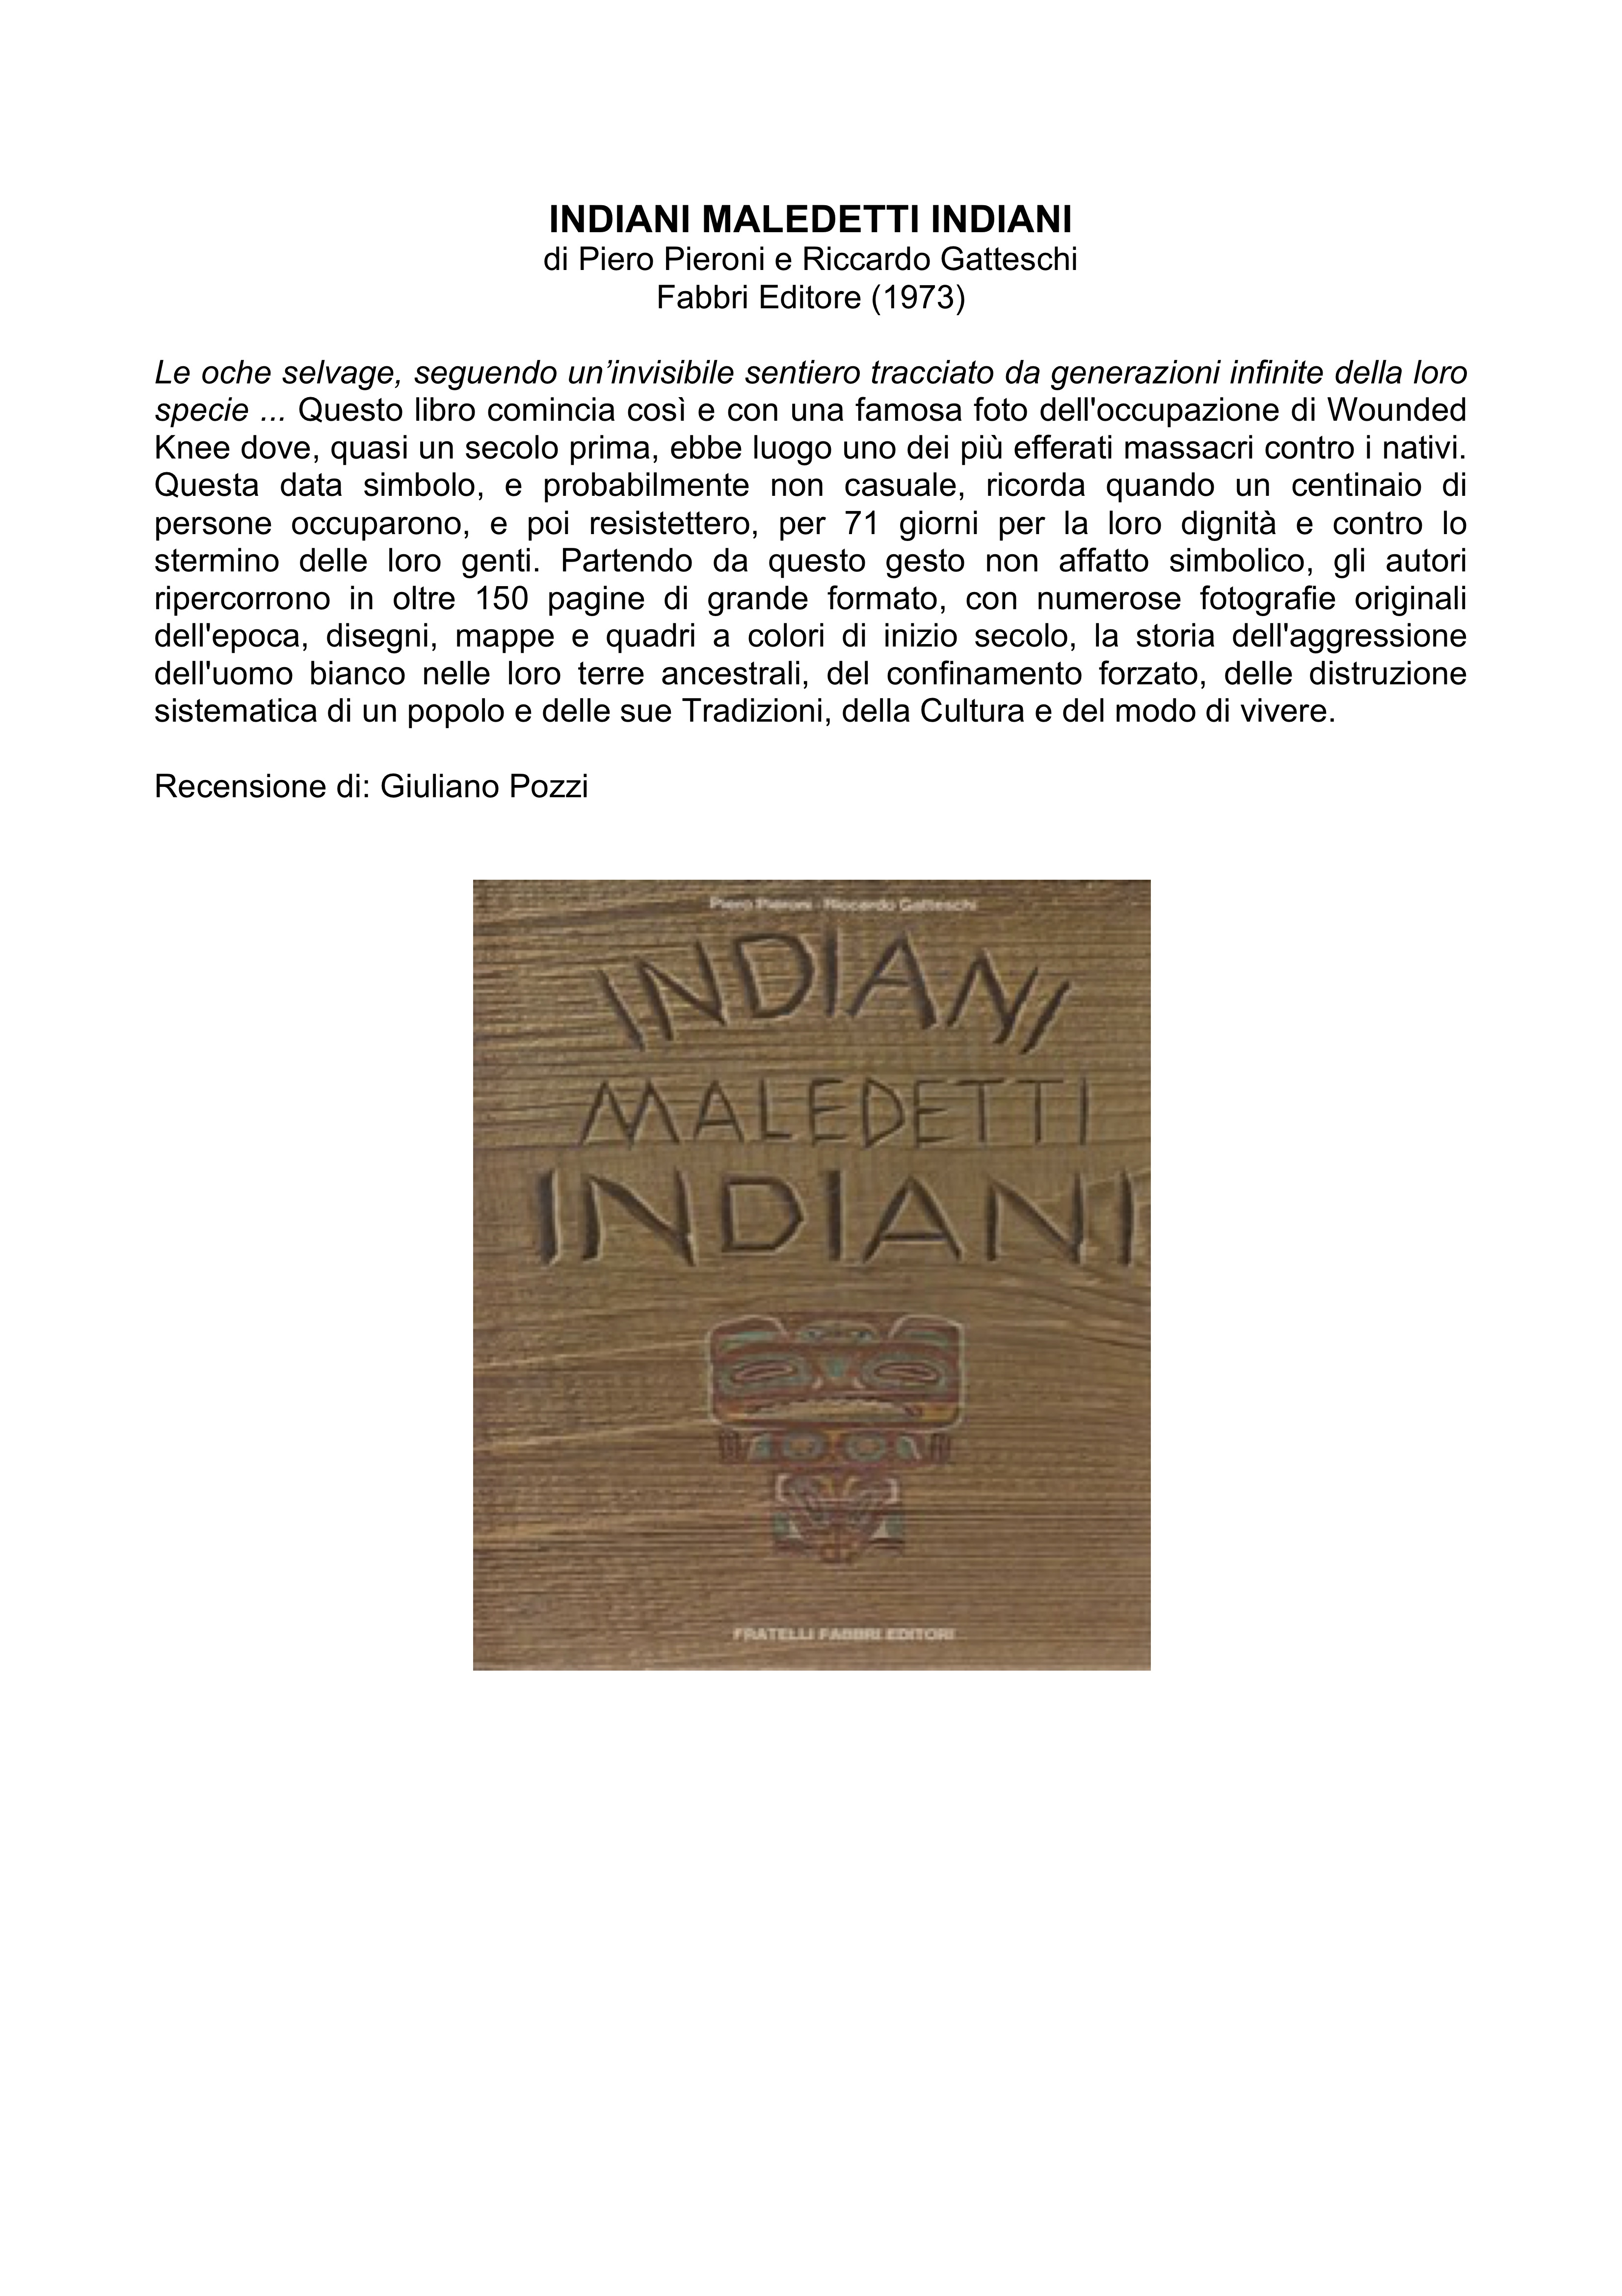 INDIANI MALEDETTI INDIANI